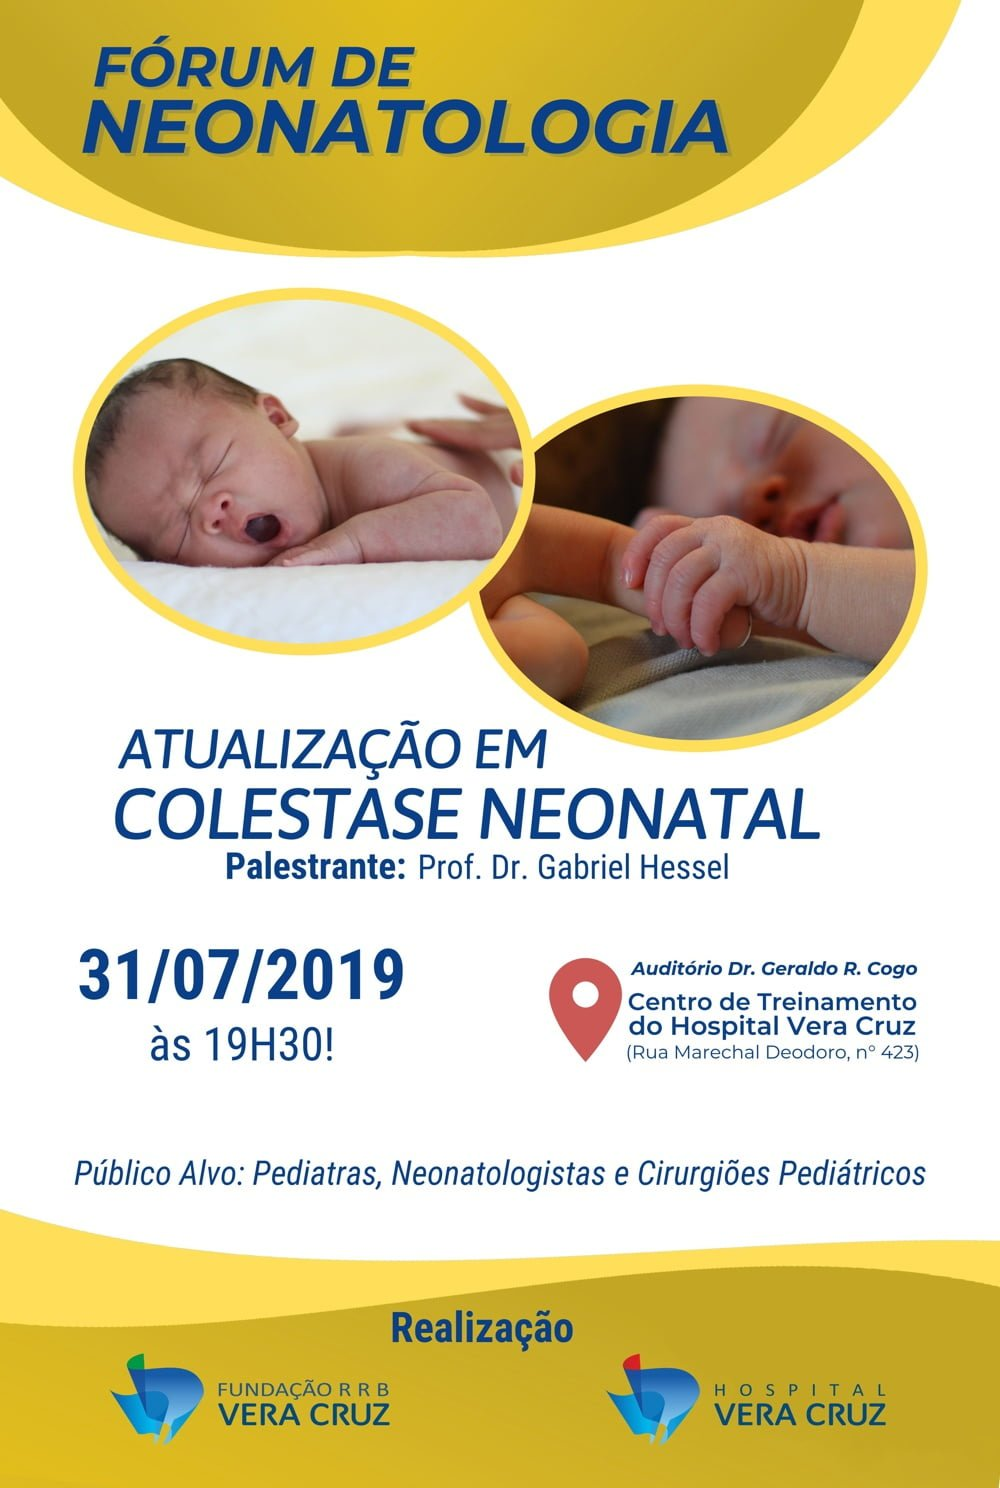 FRRB - Forum Neonatologia Julho 2019